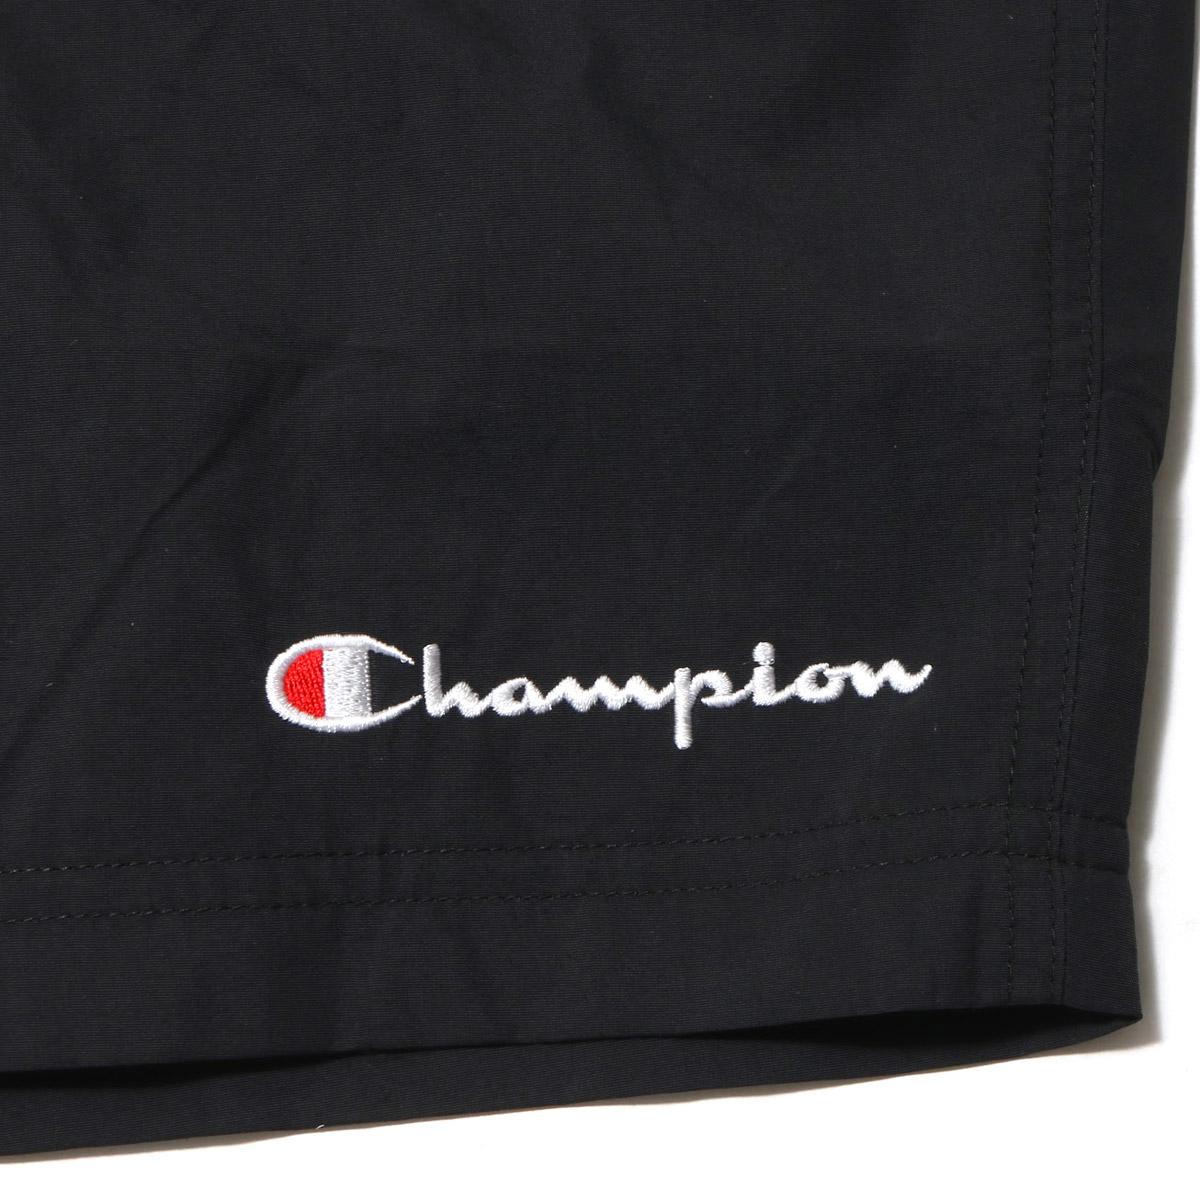 Champion SHORTS (챔피언 쇼츠) 2색전개 17 SS-I